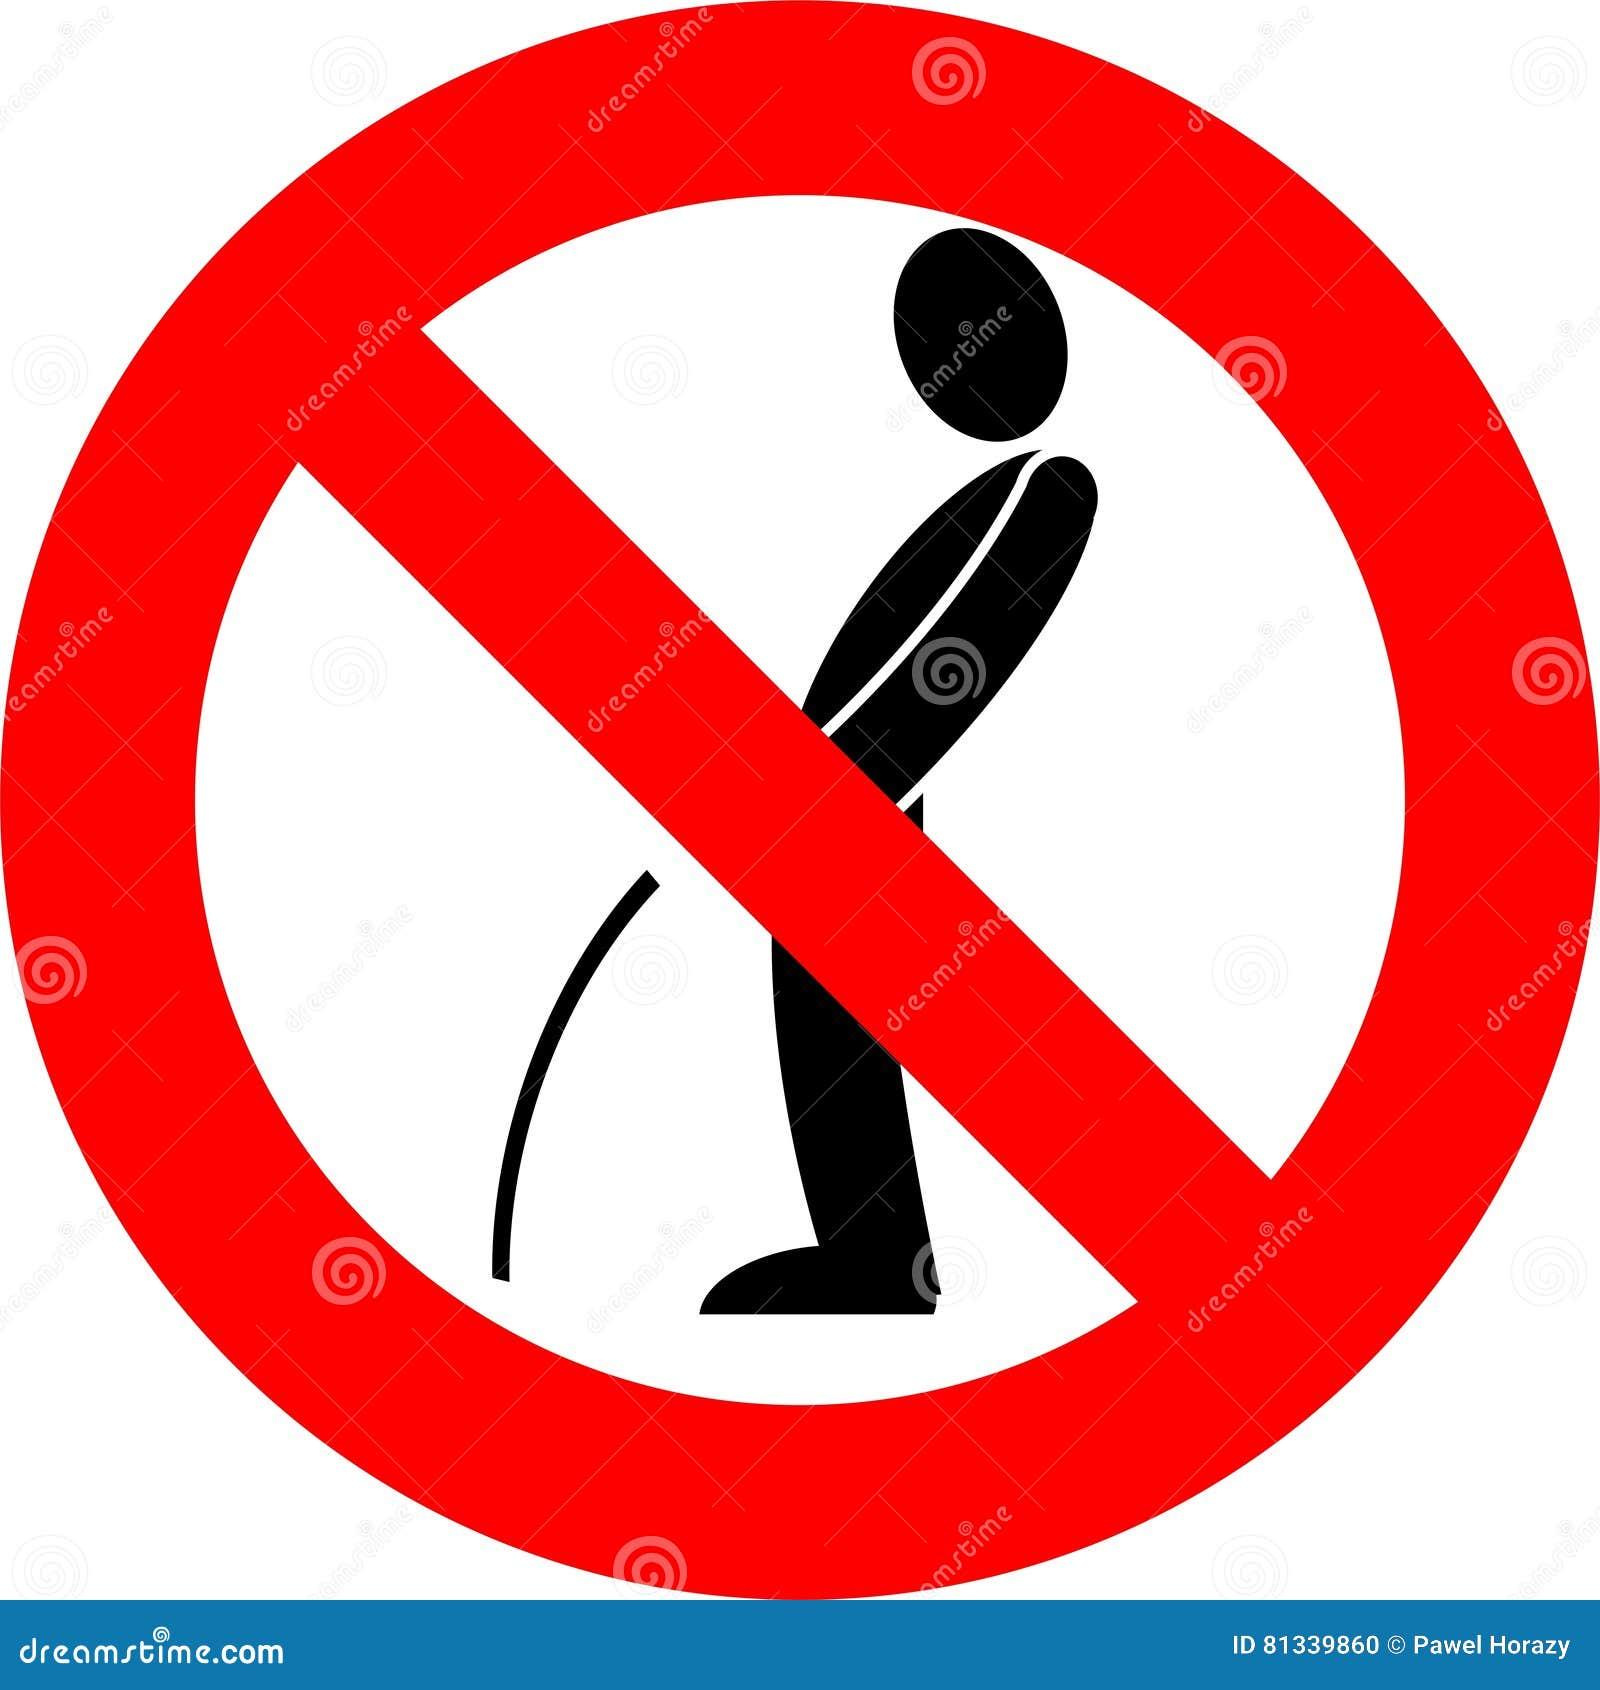 Man Peeing Sign Vector Illustration